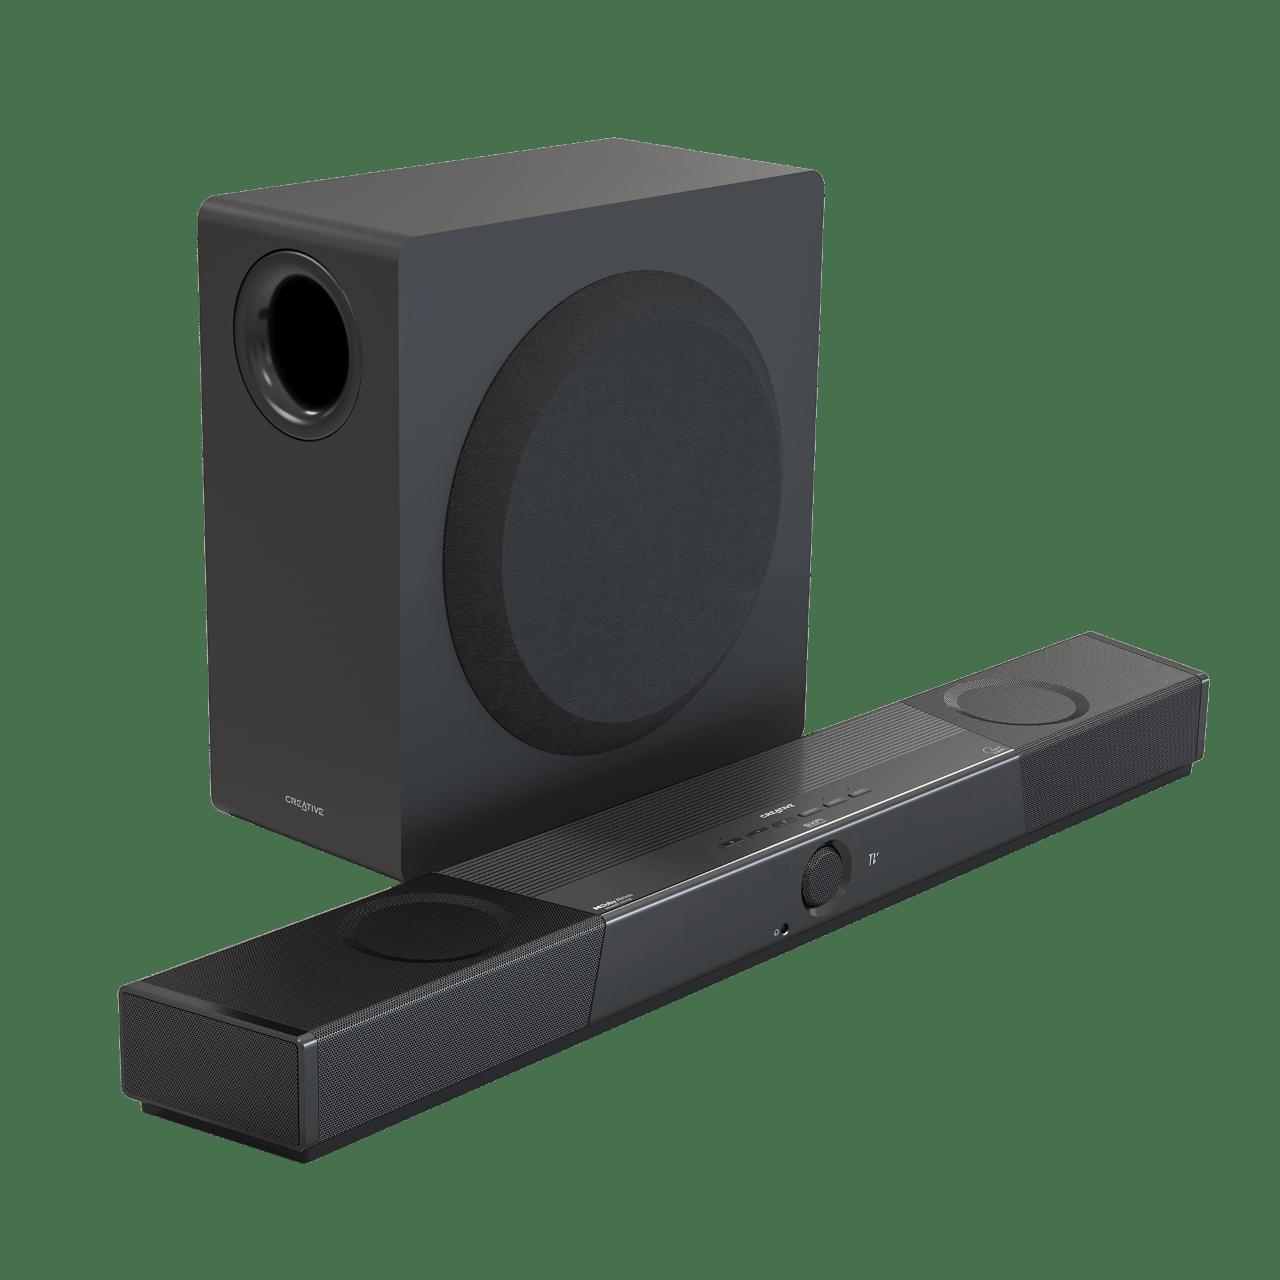 Creative annuncia la rivoluzionaria soundbar SXFI CARRIER